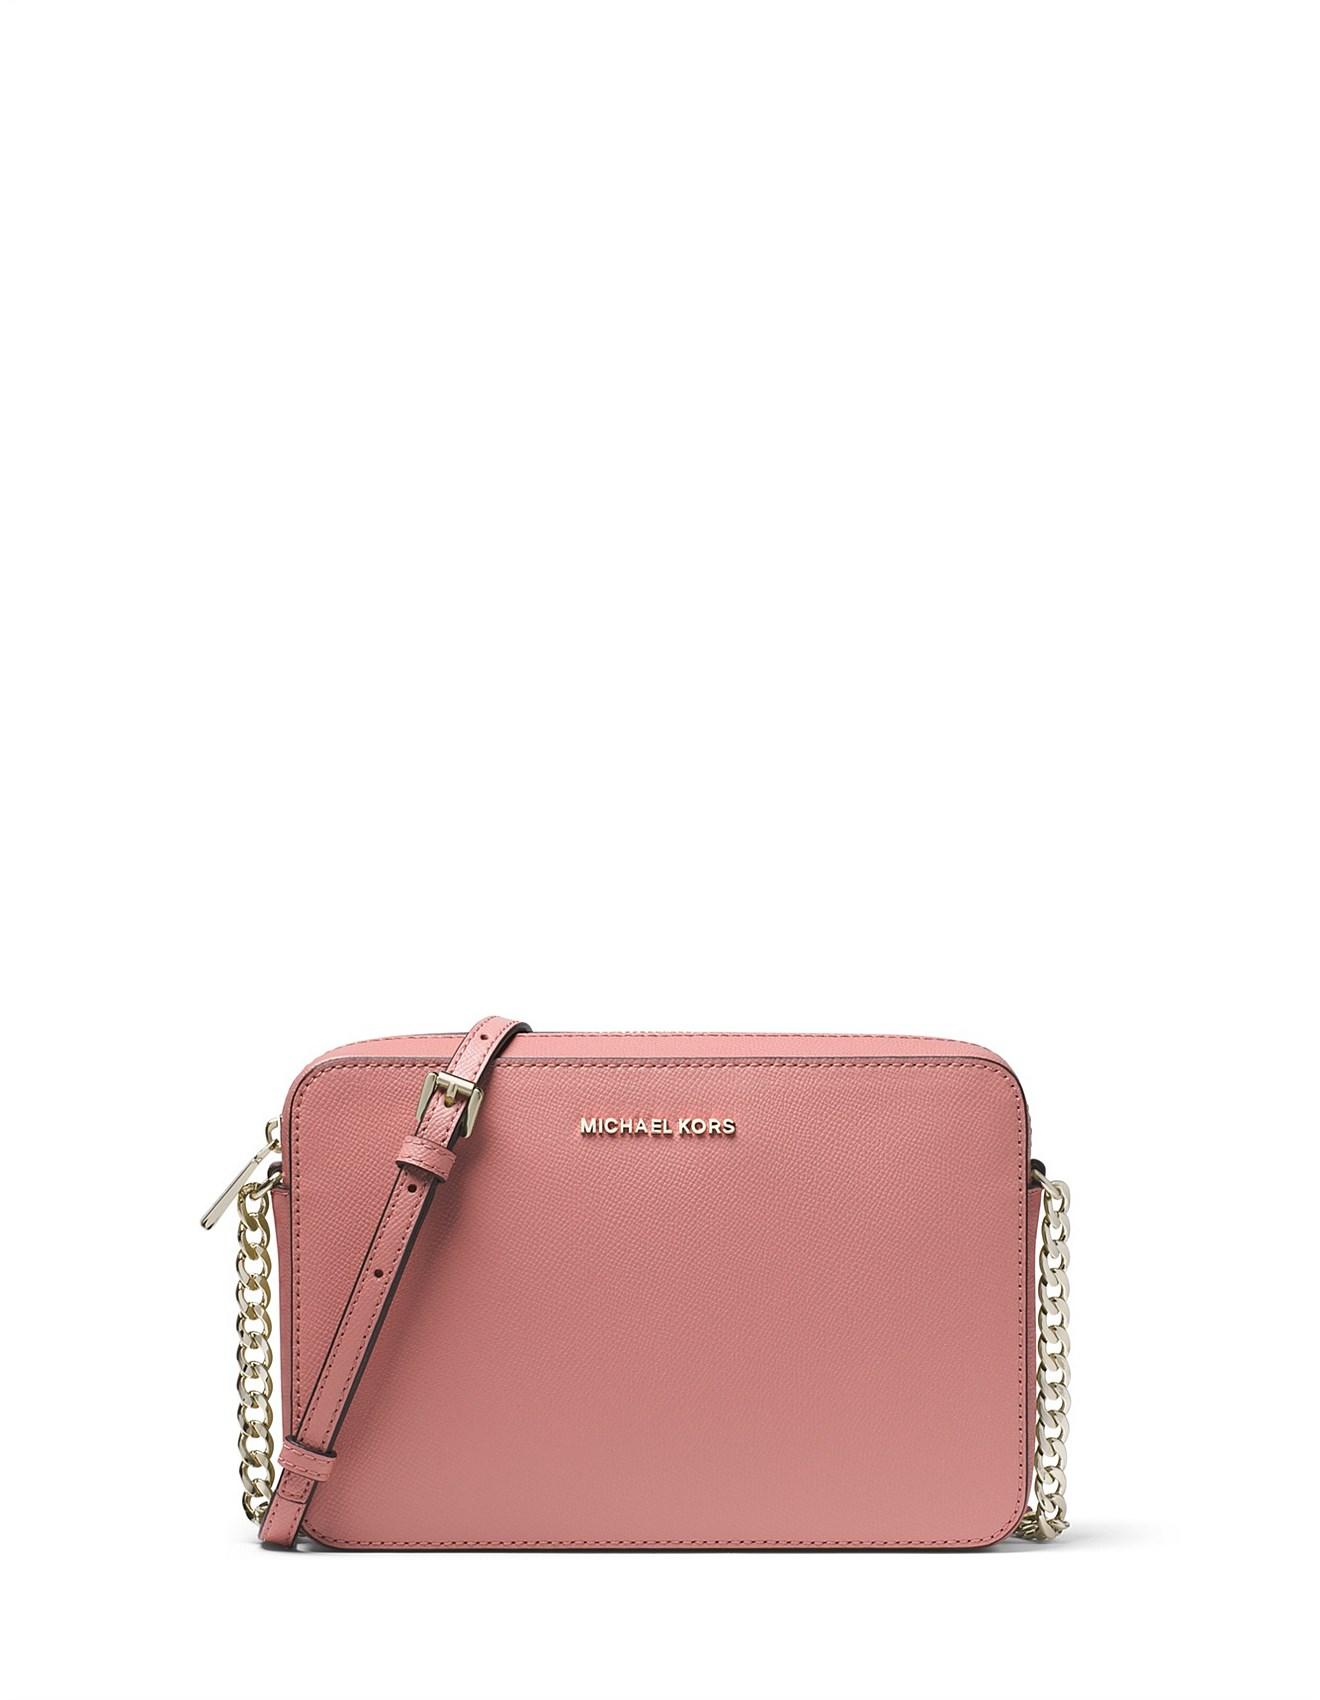 e411b8d8323a Women s Bags Sale